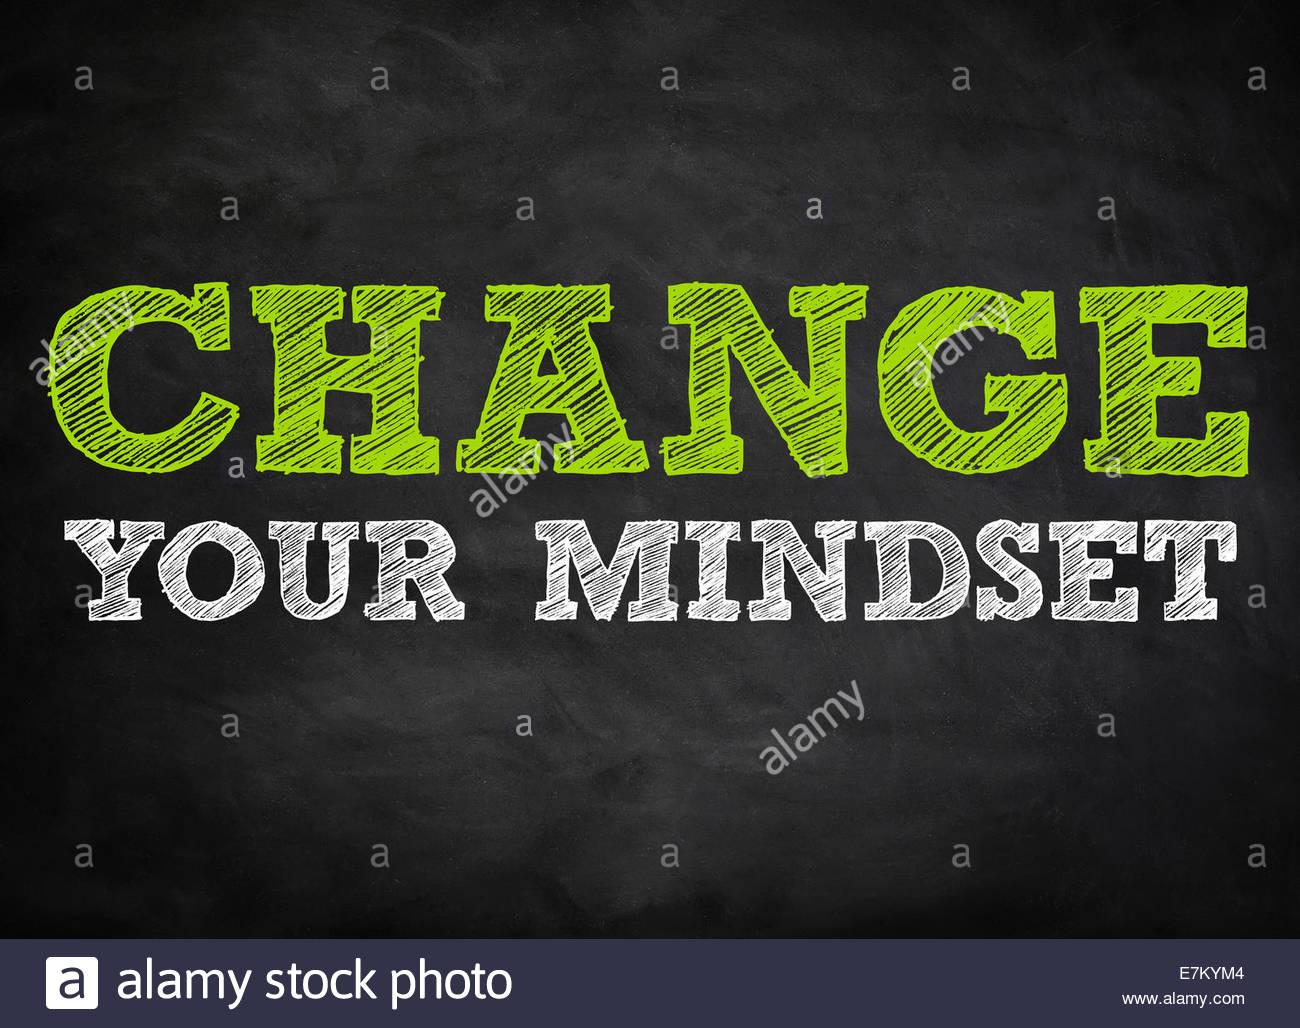 CHANGE YOUR MINDSET - chalkboard concept - Stock Image